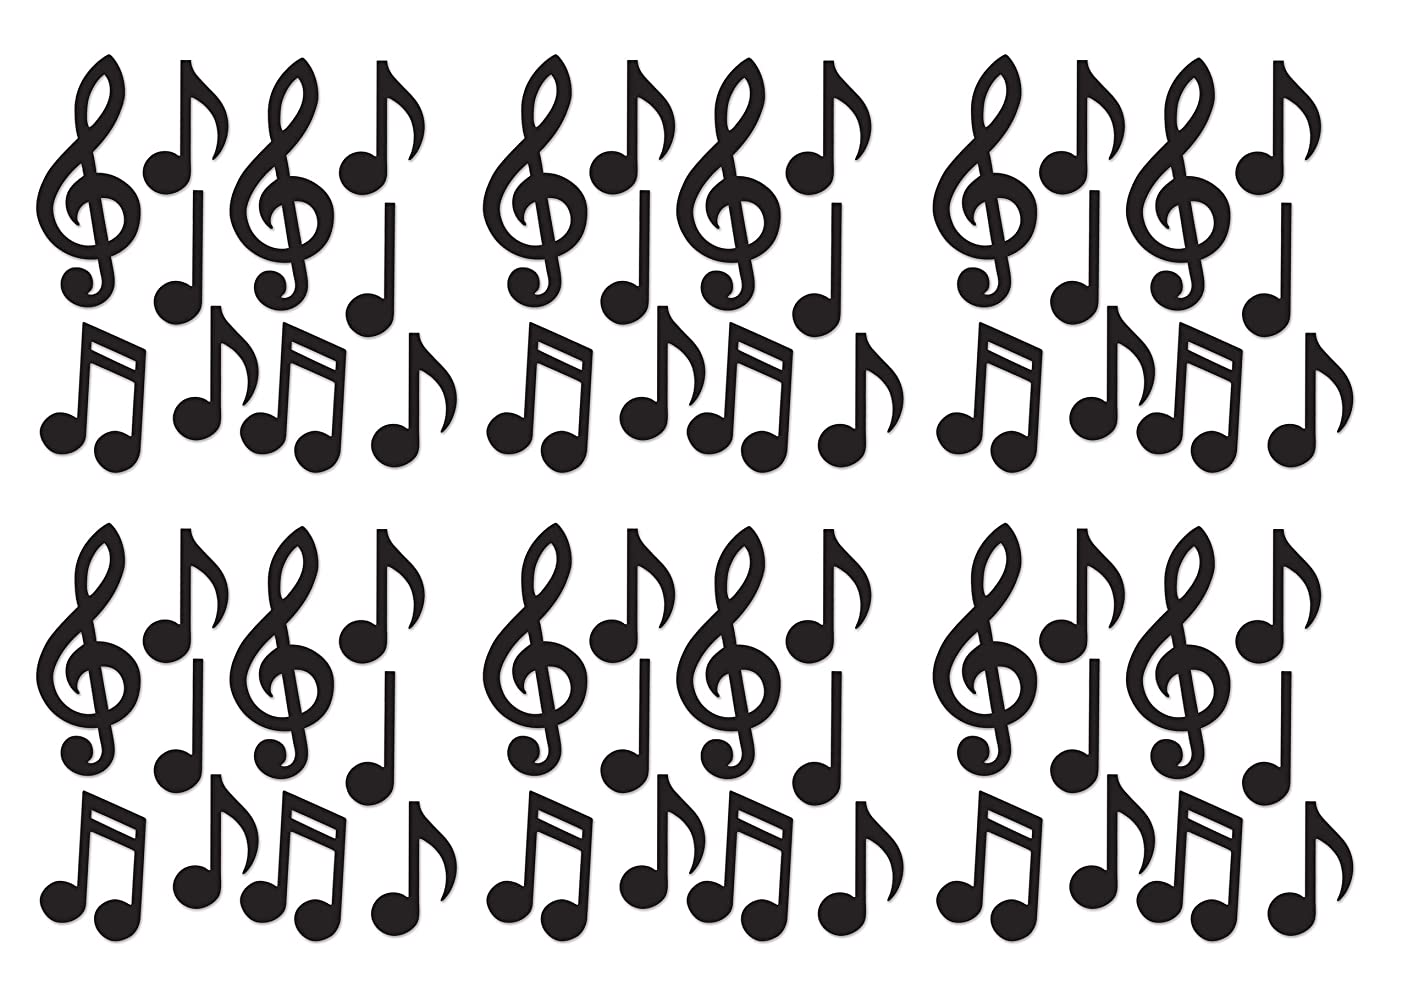 Beistle S54735-BKAZ6 Mini Musical Notes Silhouettes 60 Piece, 5.5